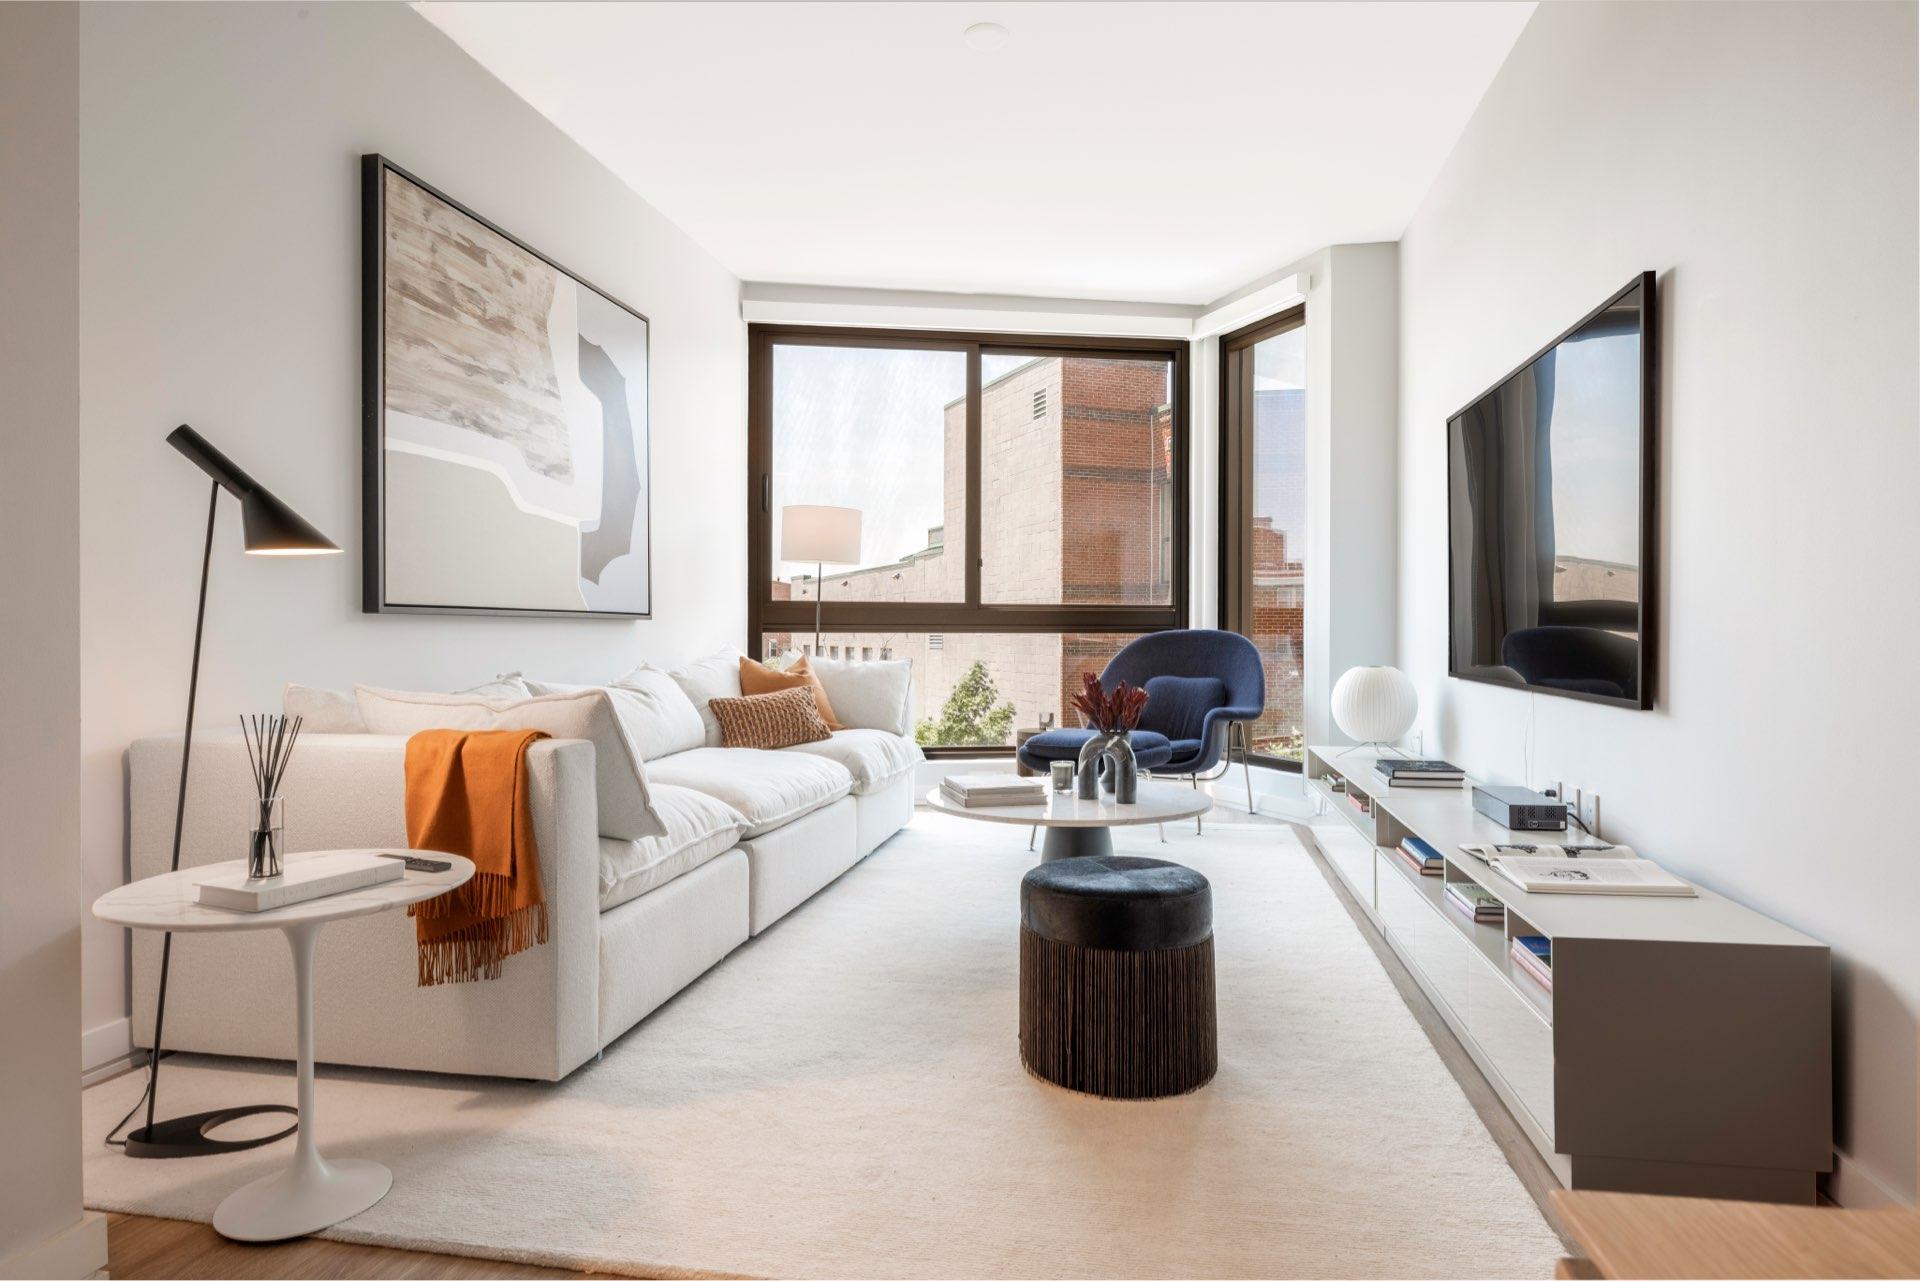 Lease an Adams Morgan luxury apartment home